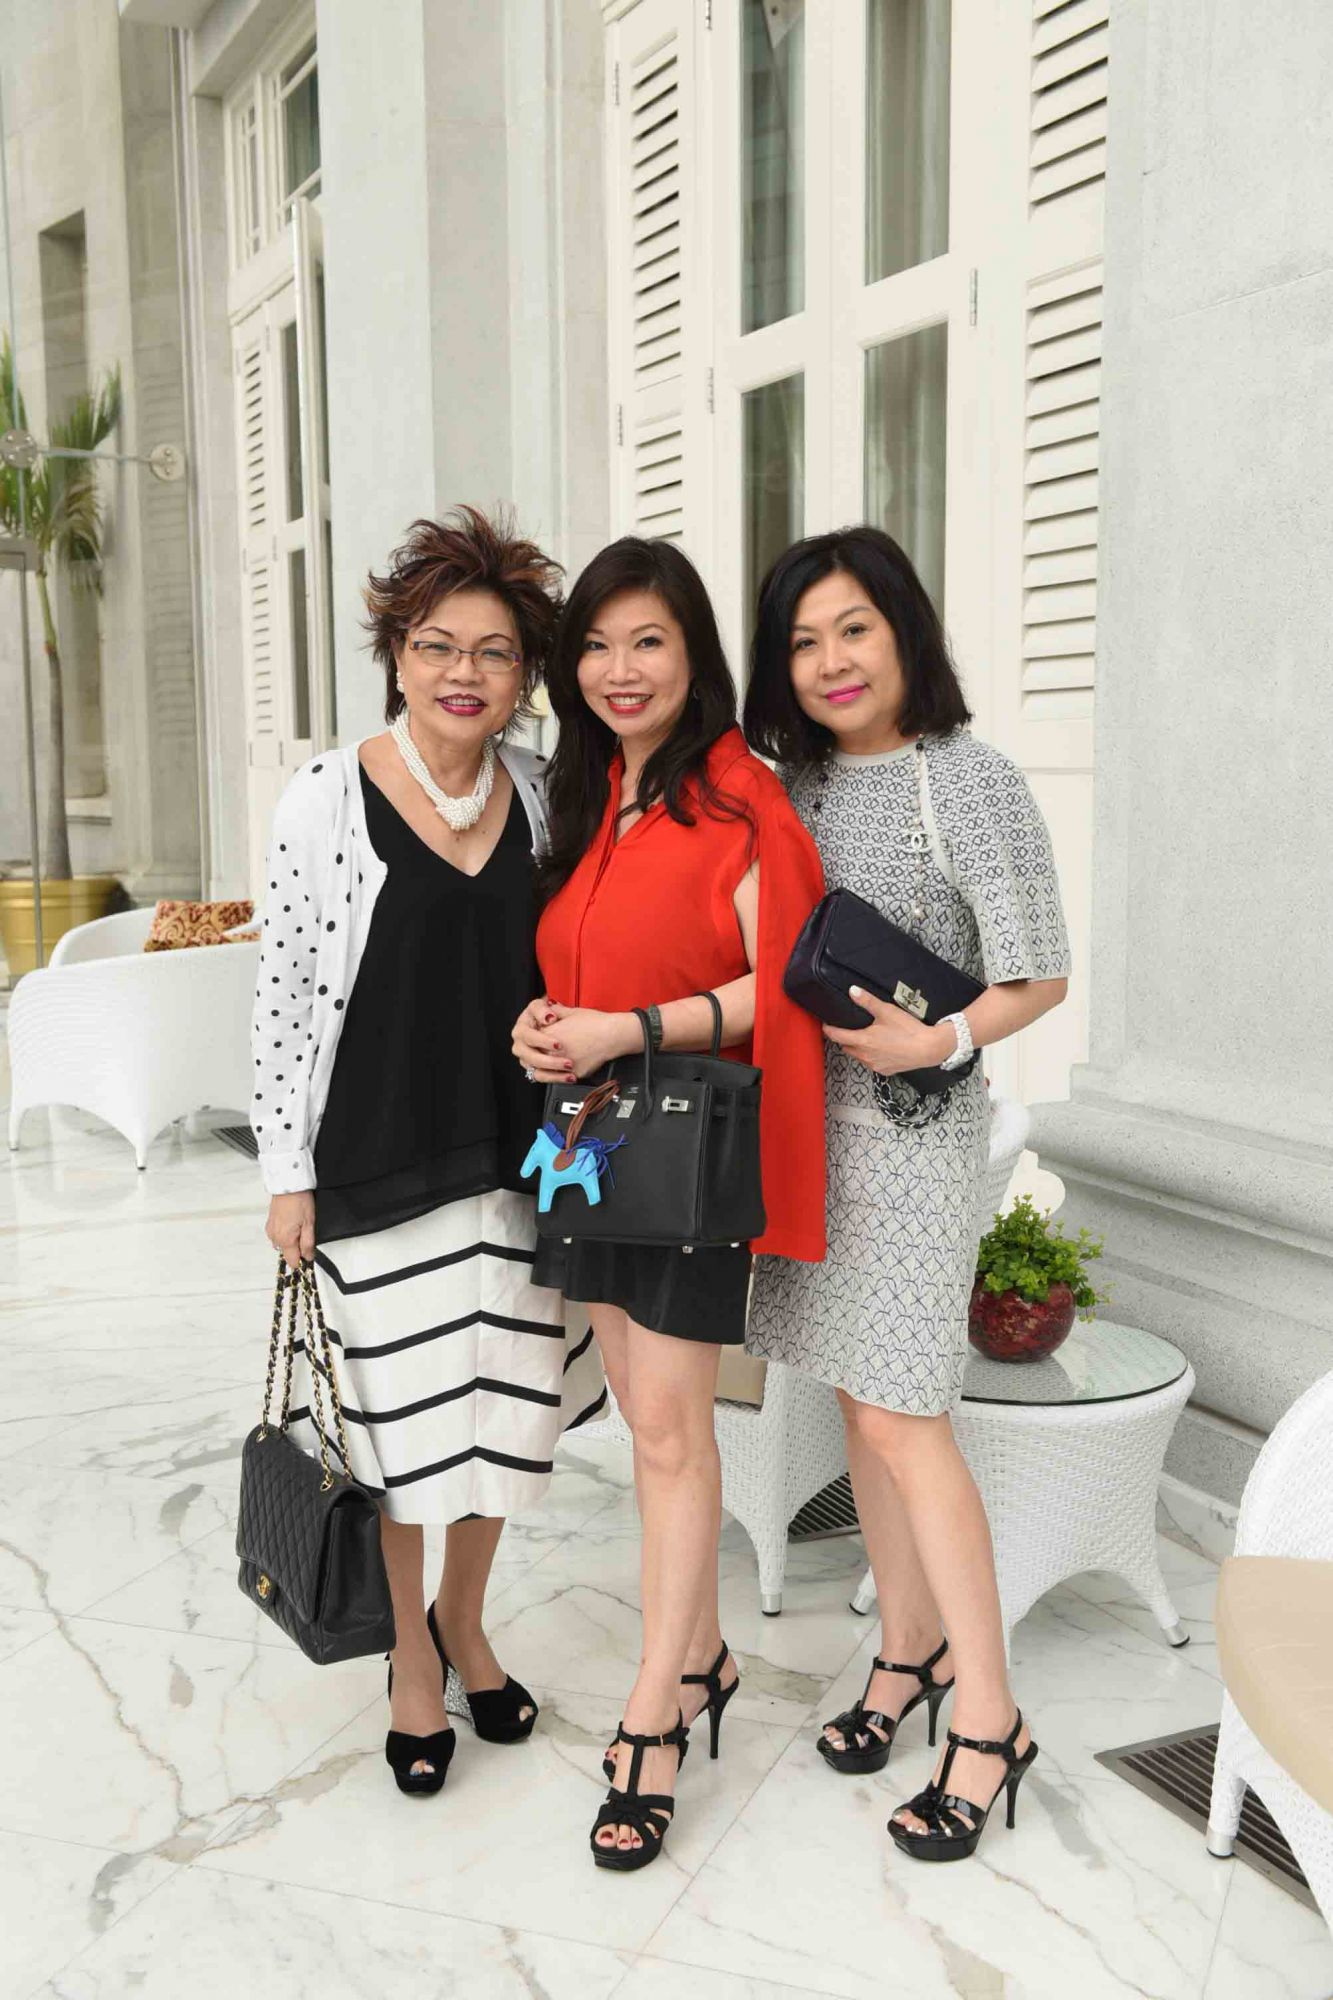 Doris Tan, Jessie Ho-Thong, Lilian Low